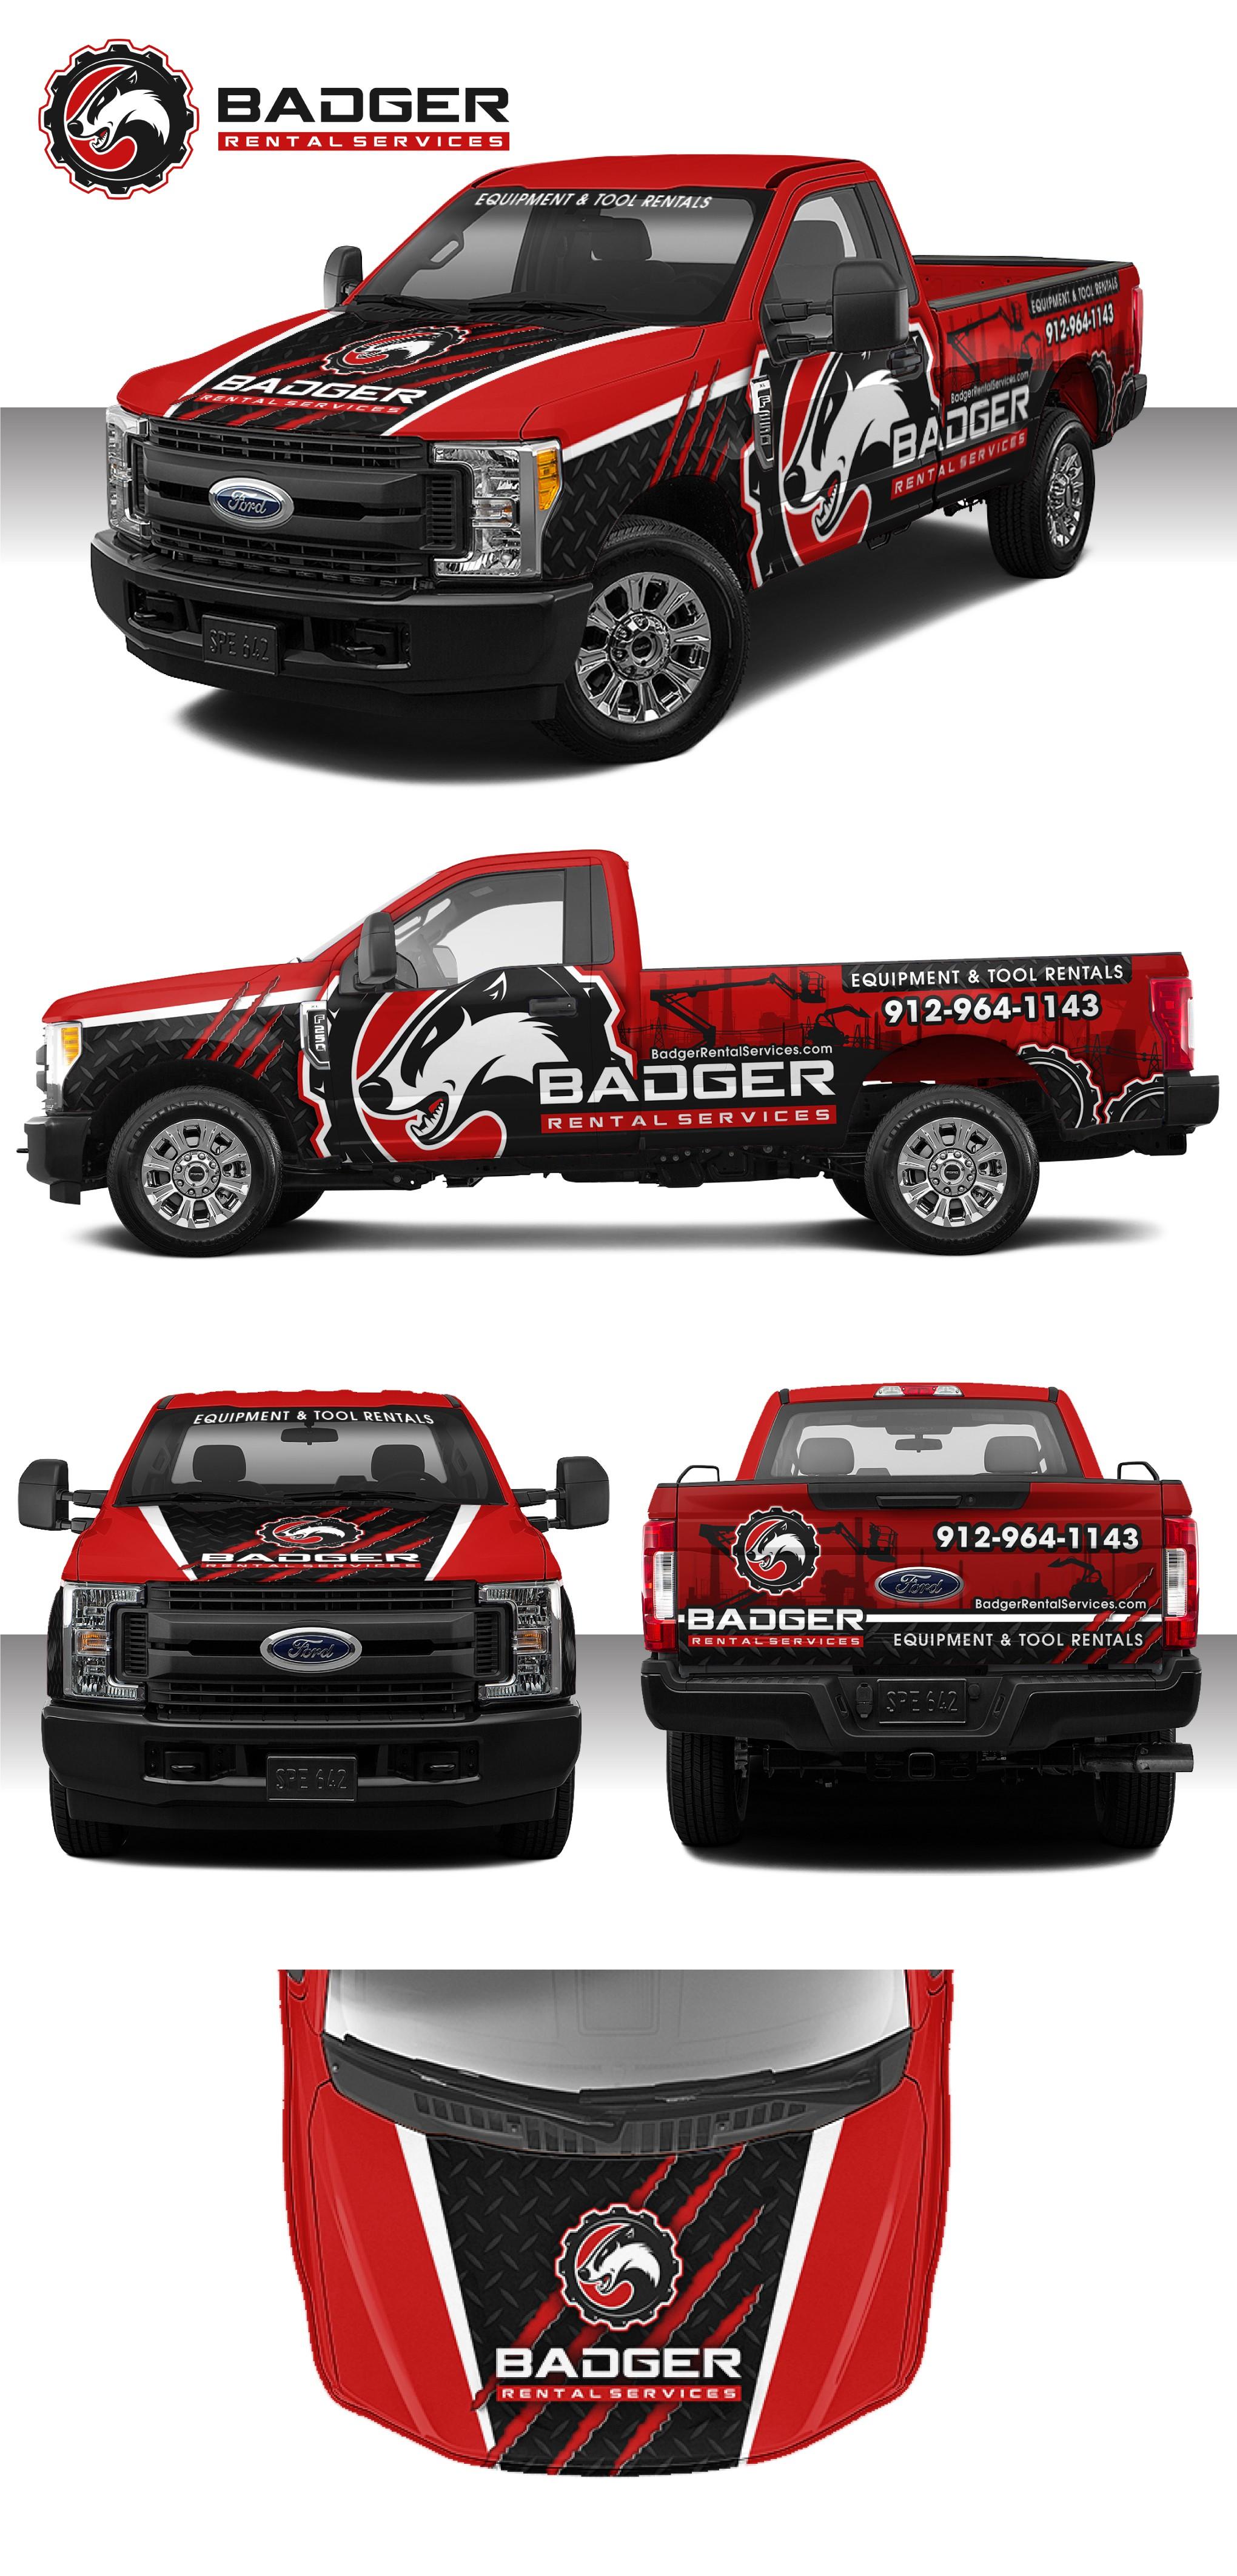 Wrap Badger Rental's Trucks!